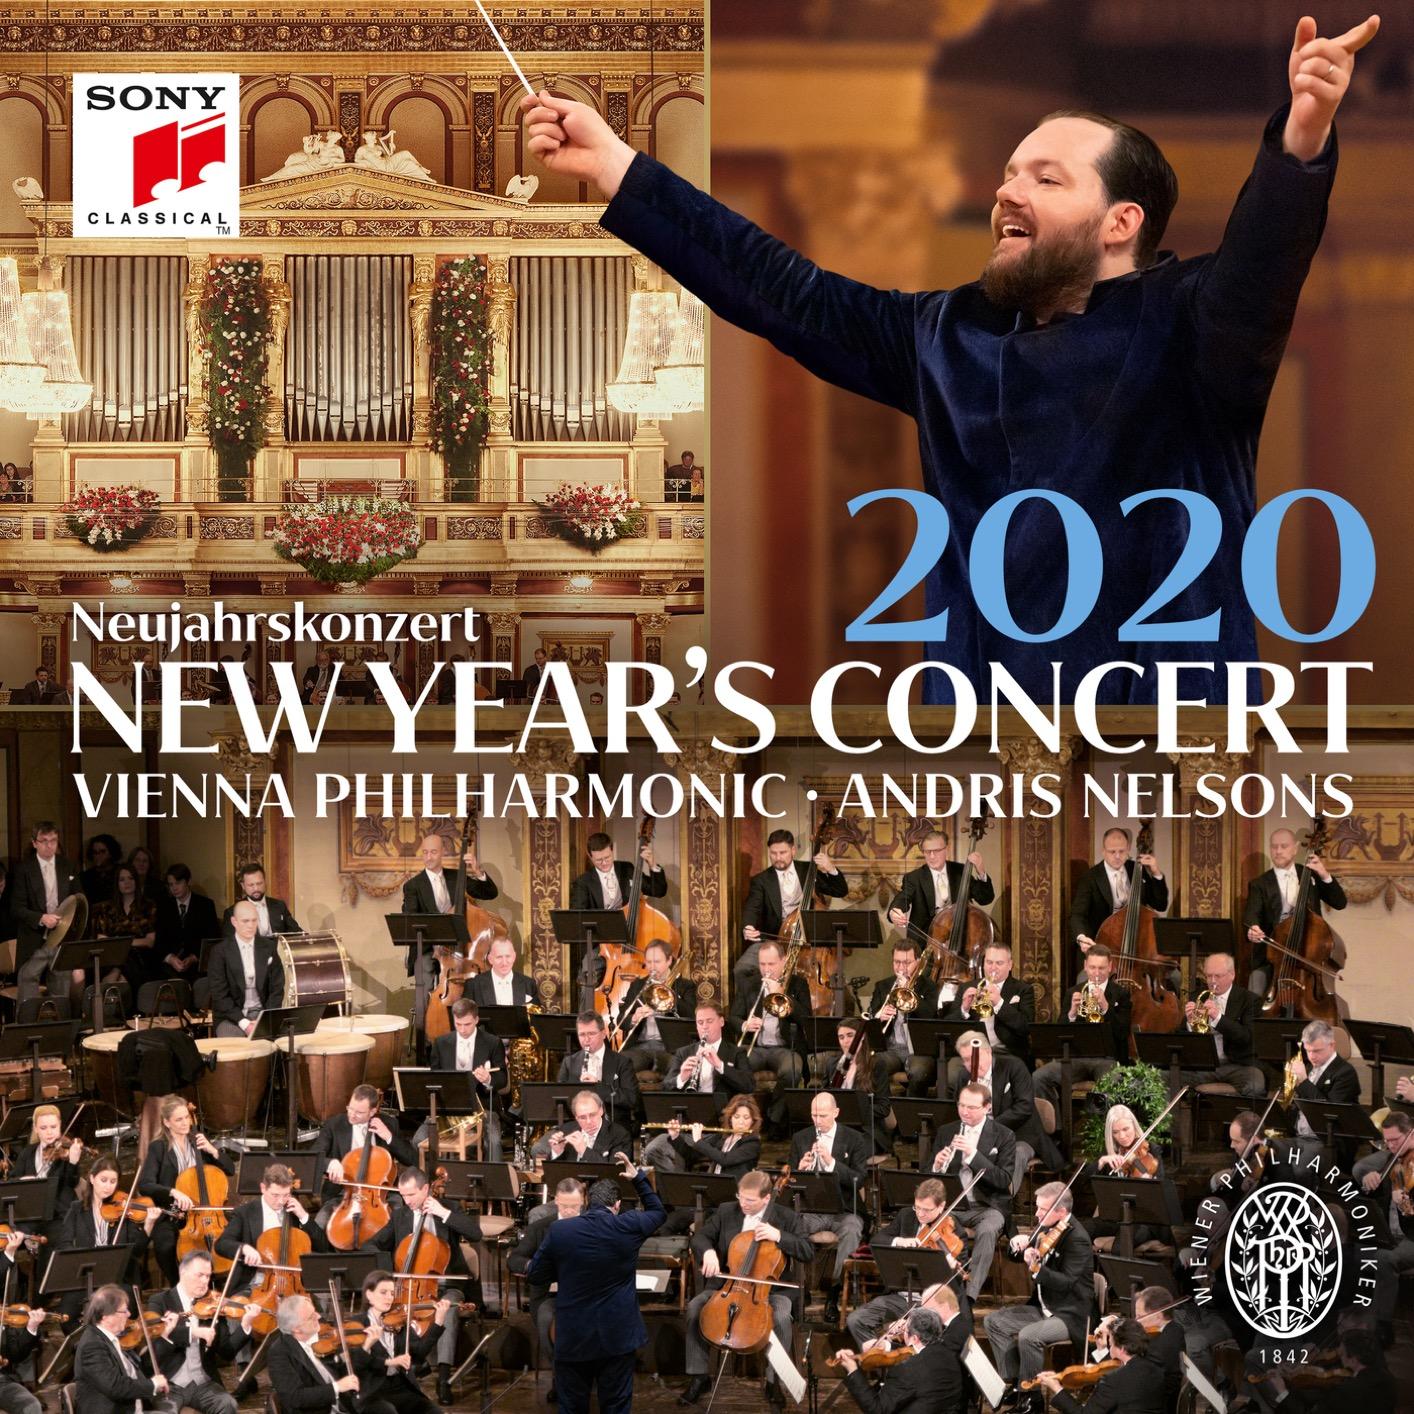 Wiener Philharmoniker Vienna New Year's Concert 2020